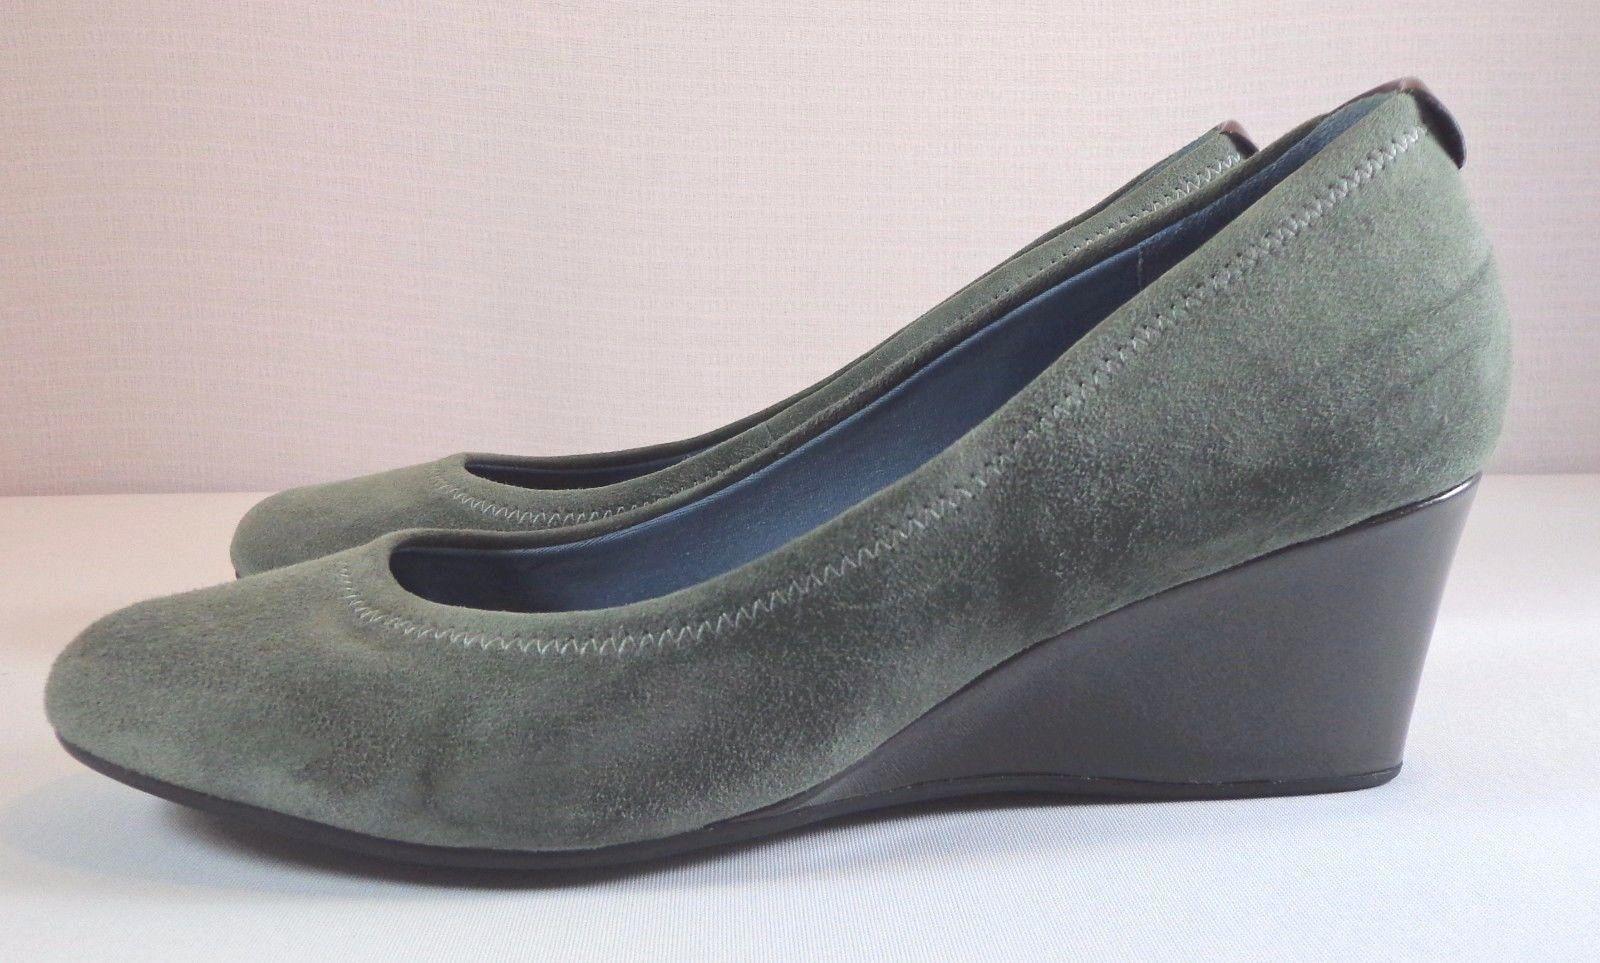 Rockport Adiprene Wedge Heel Pumps Womens and 31 similar items. S l1600 6cf8de581f0